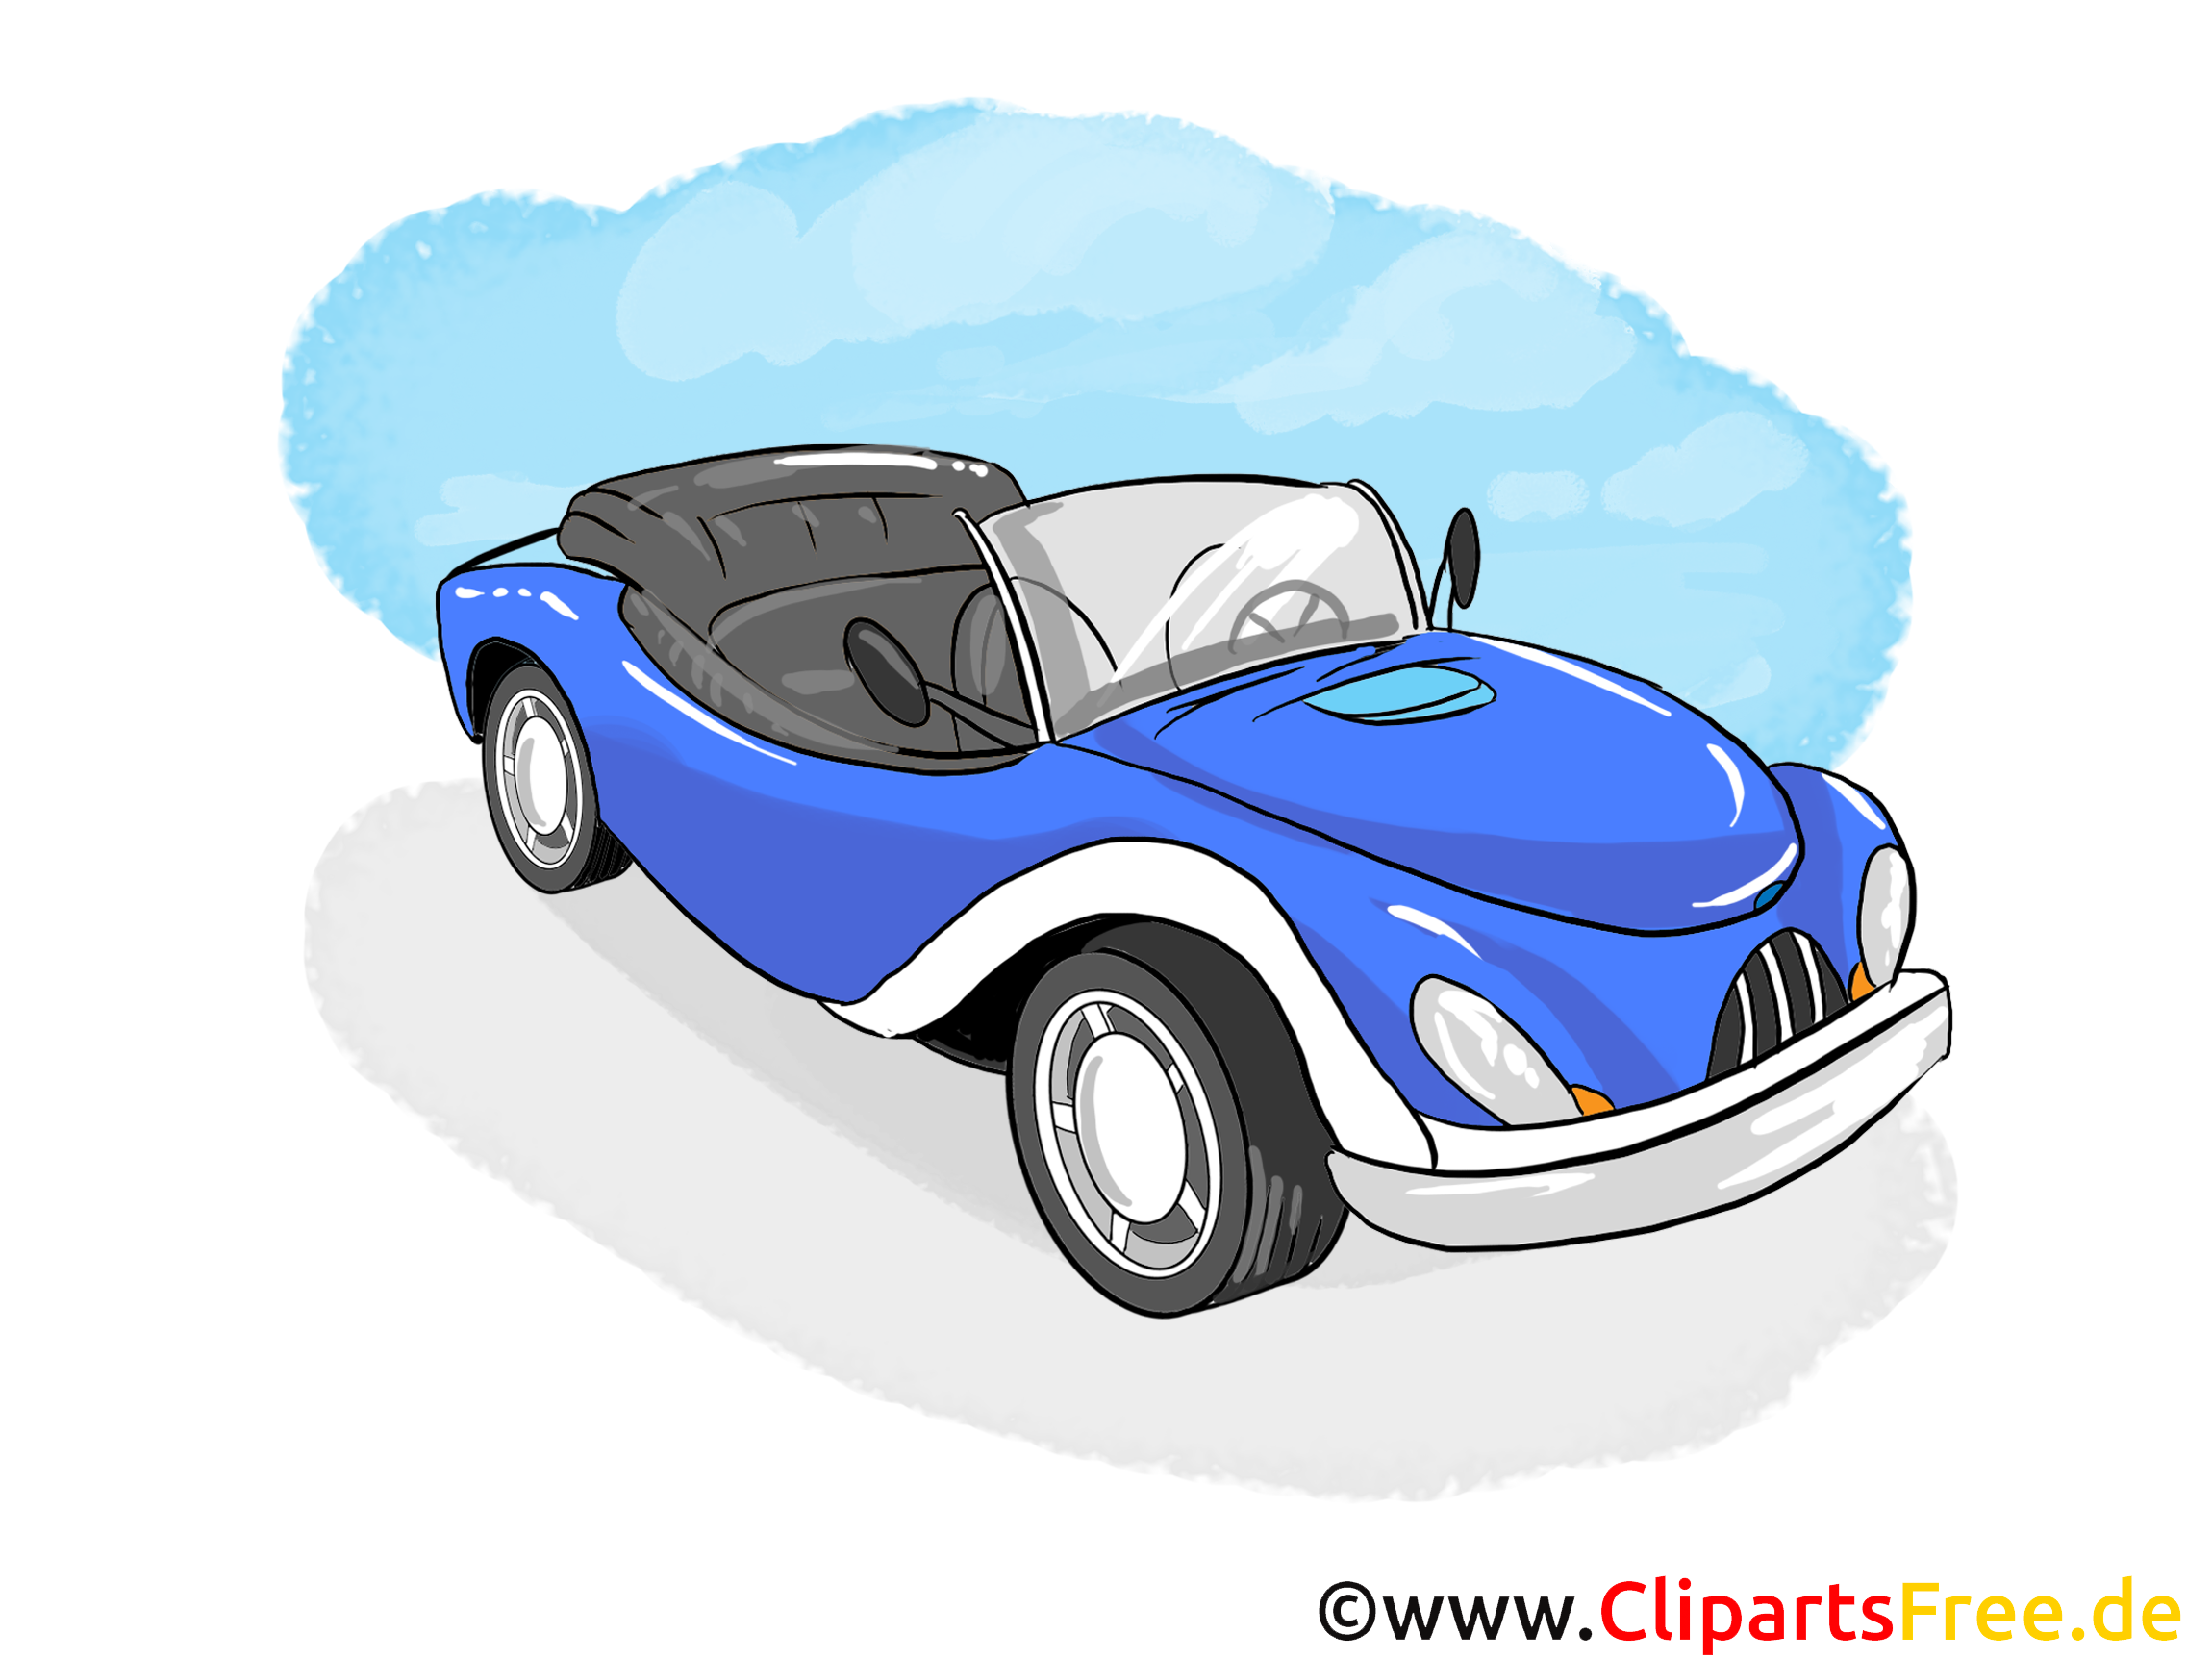 Cabrio Vehicle Clip Art free